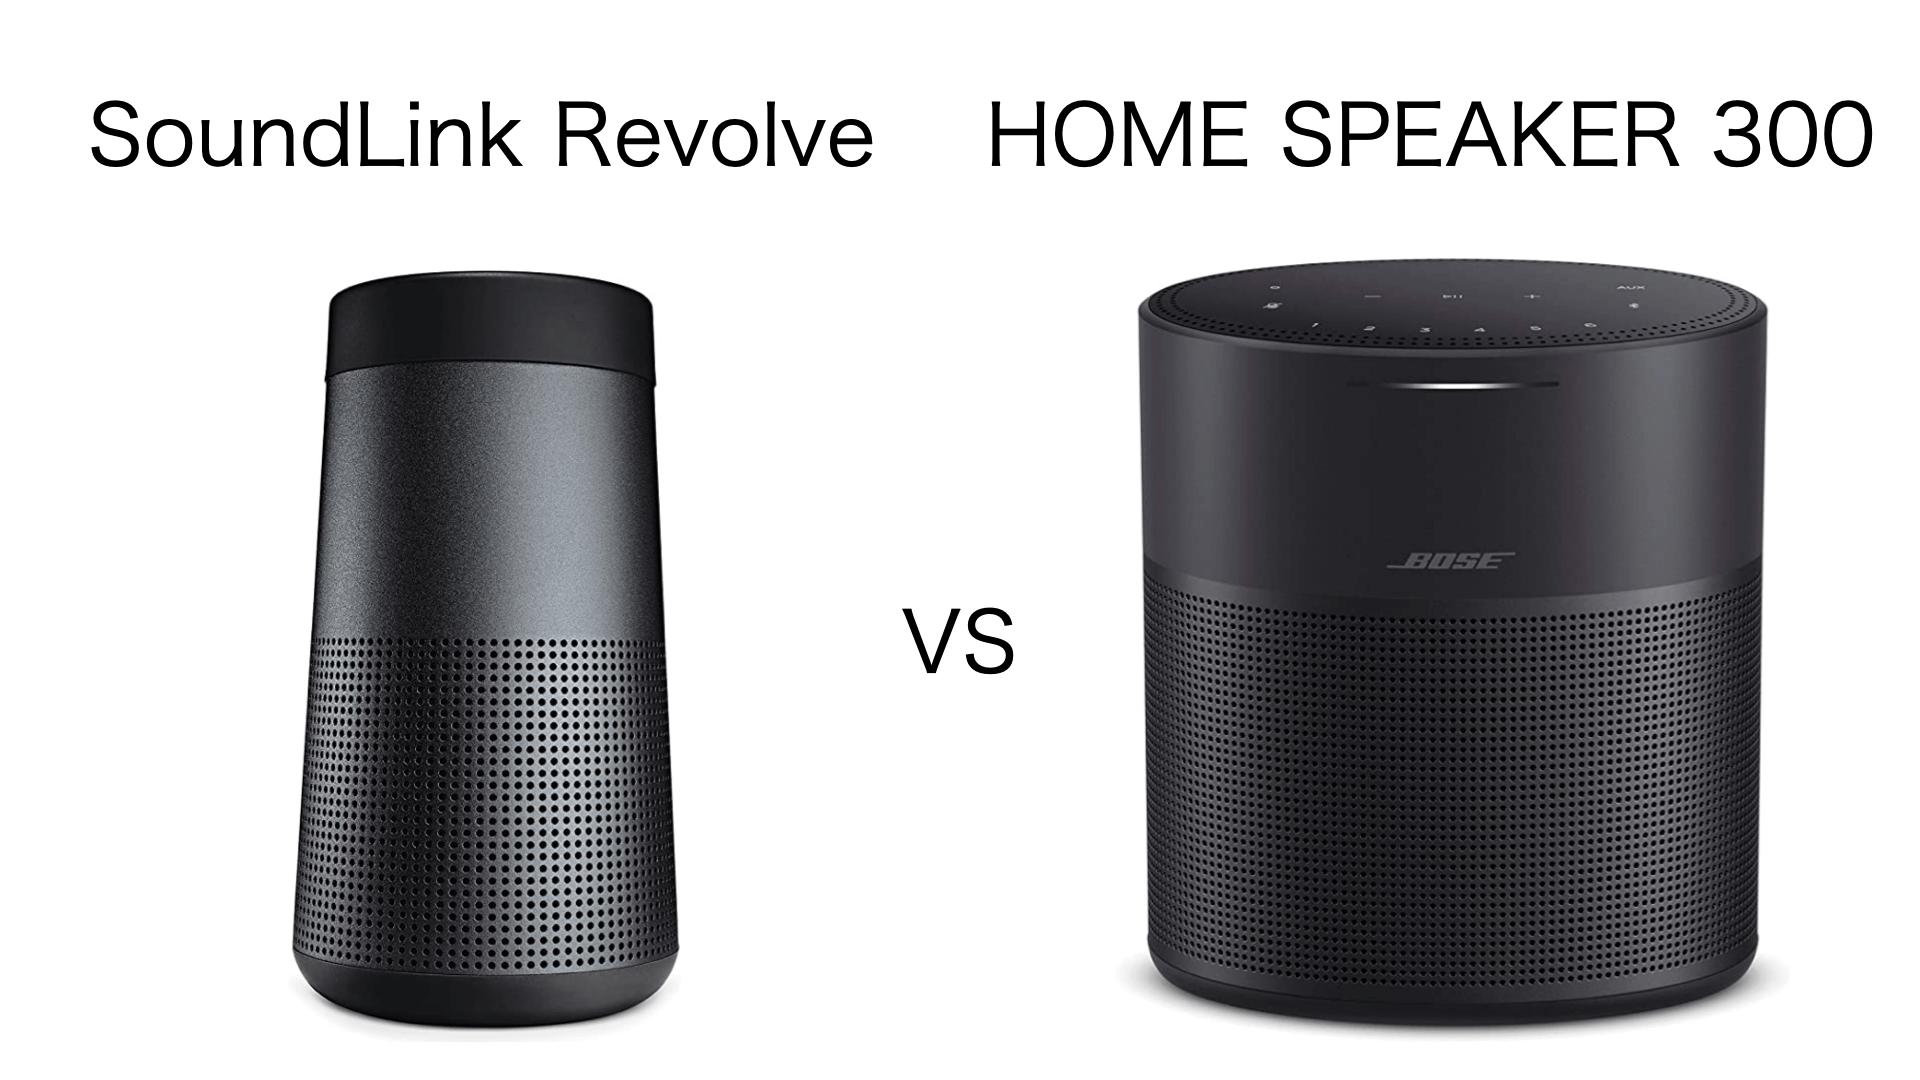 BOSE Soundlink RevolveとHome Speaker 300はどちらを買うべきか? ポイントは持ち運びとアレクサ。